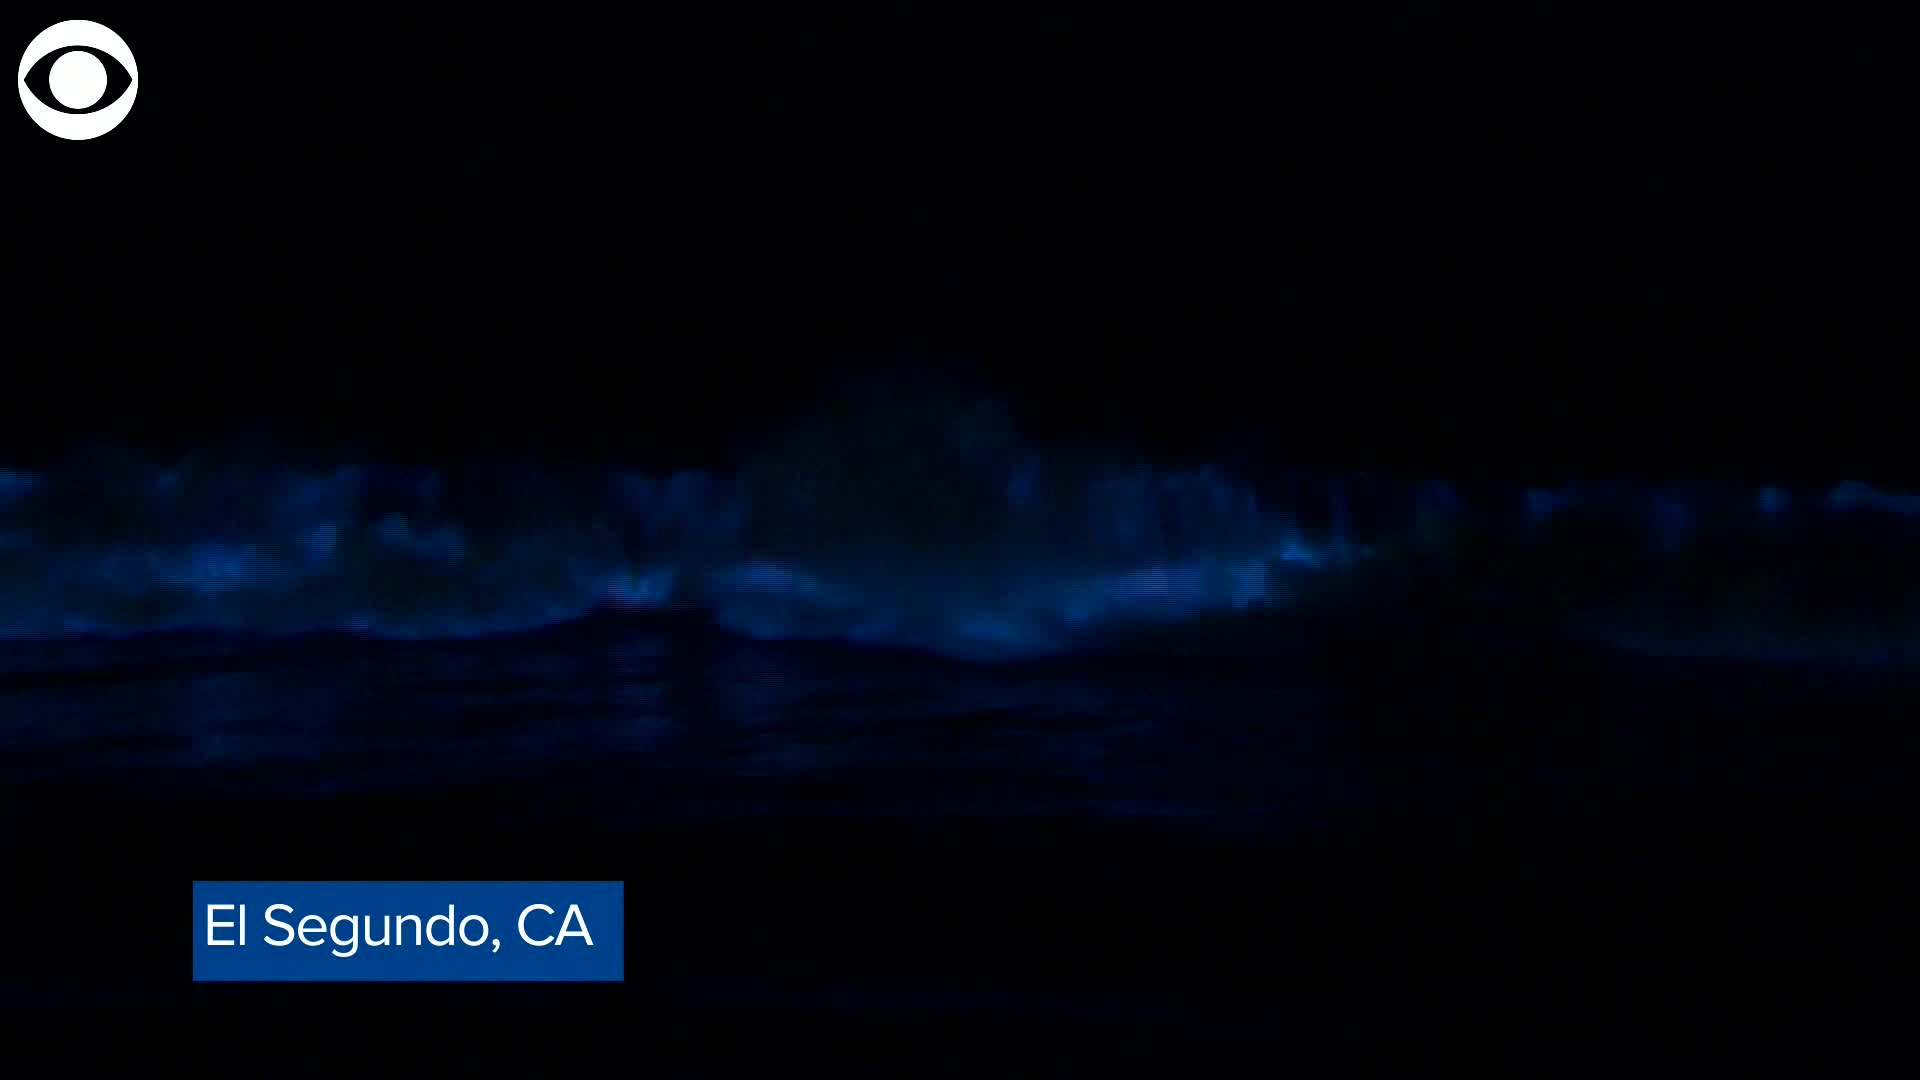 Microscopic Marine Algae Causes Waves To Give Light